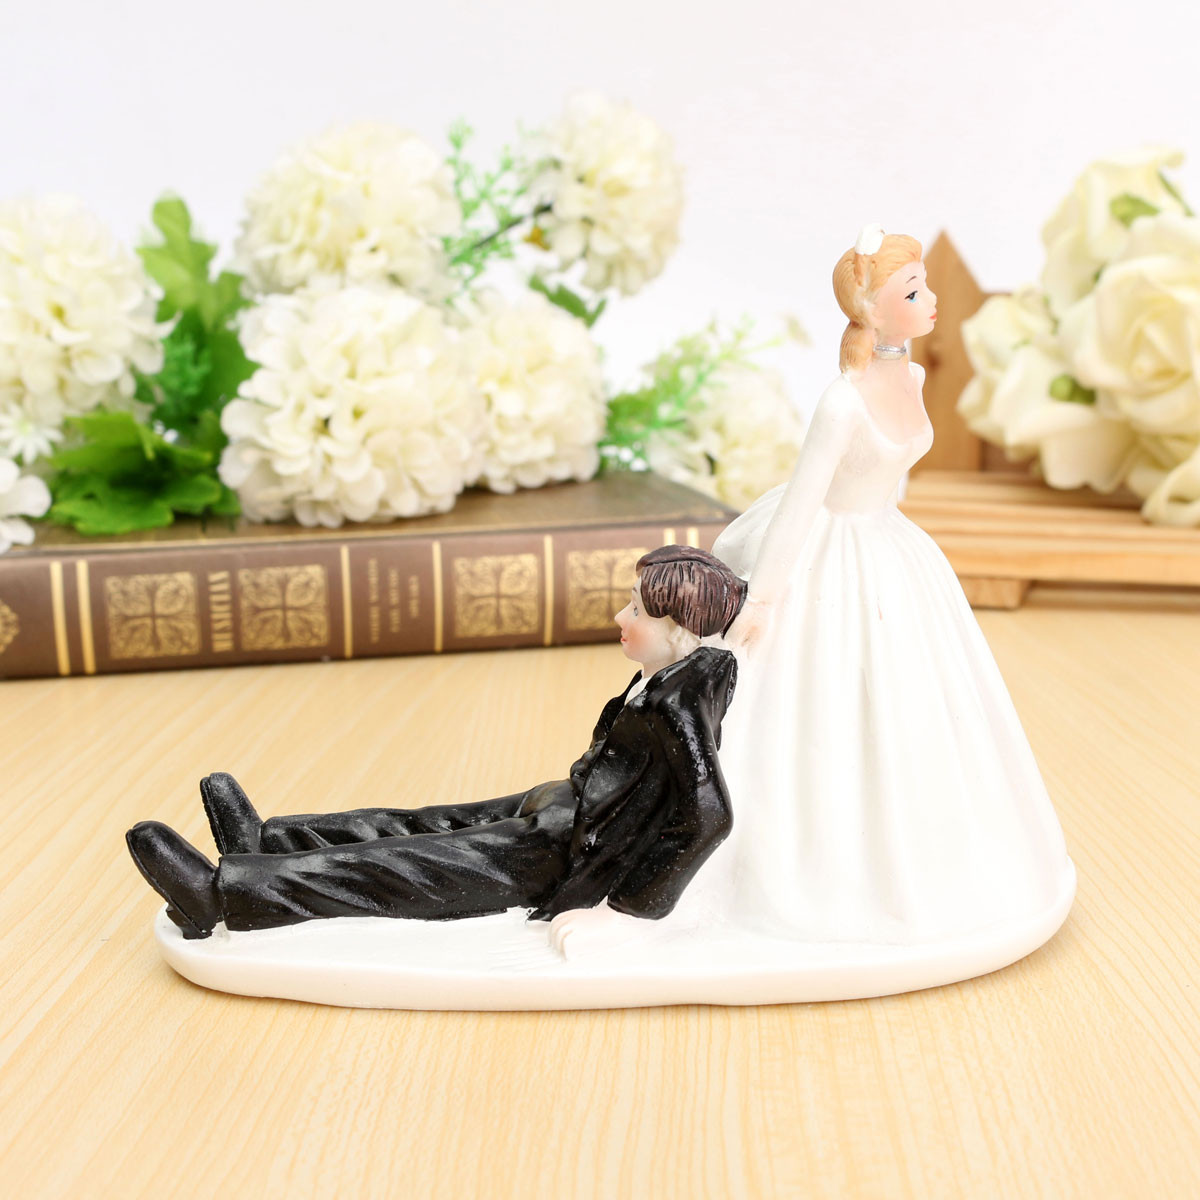 FUNNY ROMANTIC WEDDING CAKE TOPPER FIGURE BRIDE GROOM